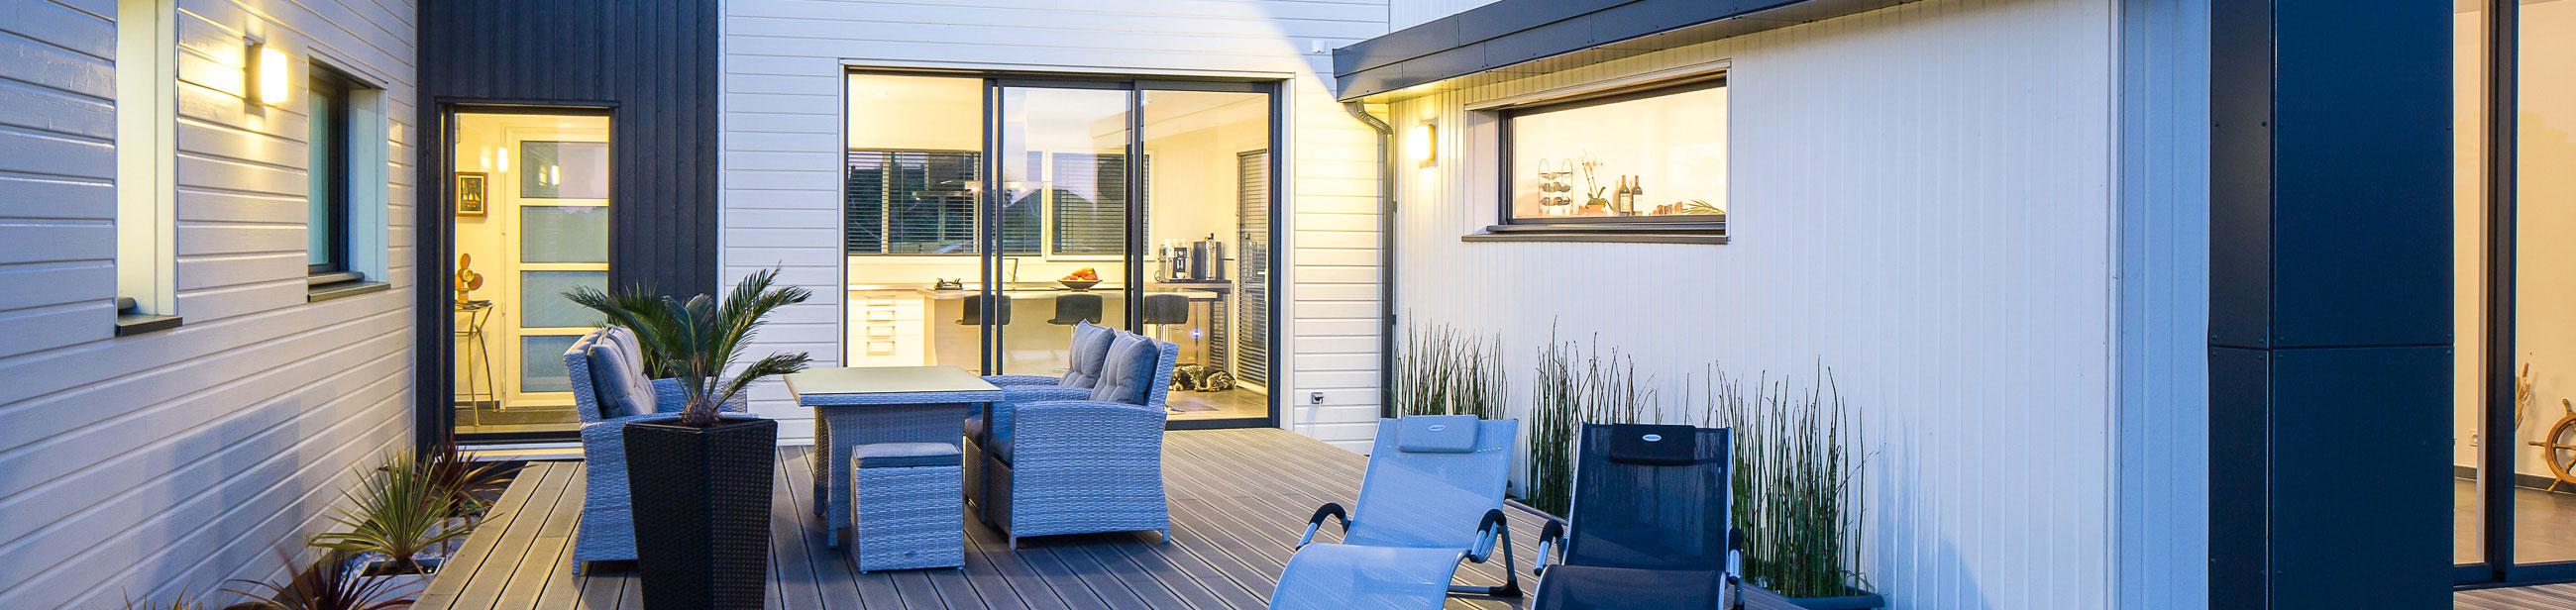 mise en place d un dispositif digital. Black Bedroom Furniture Sets. Home Design Ideas